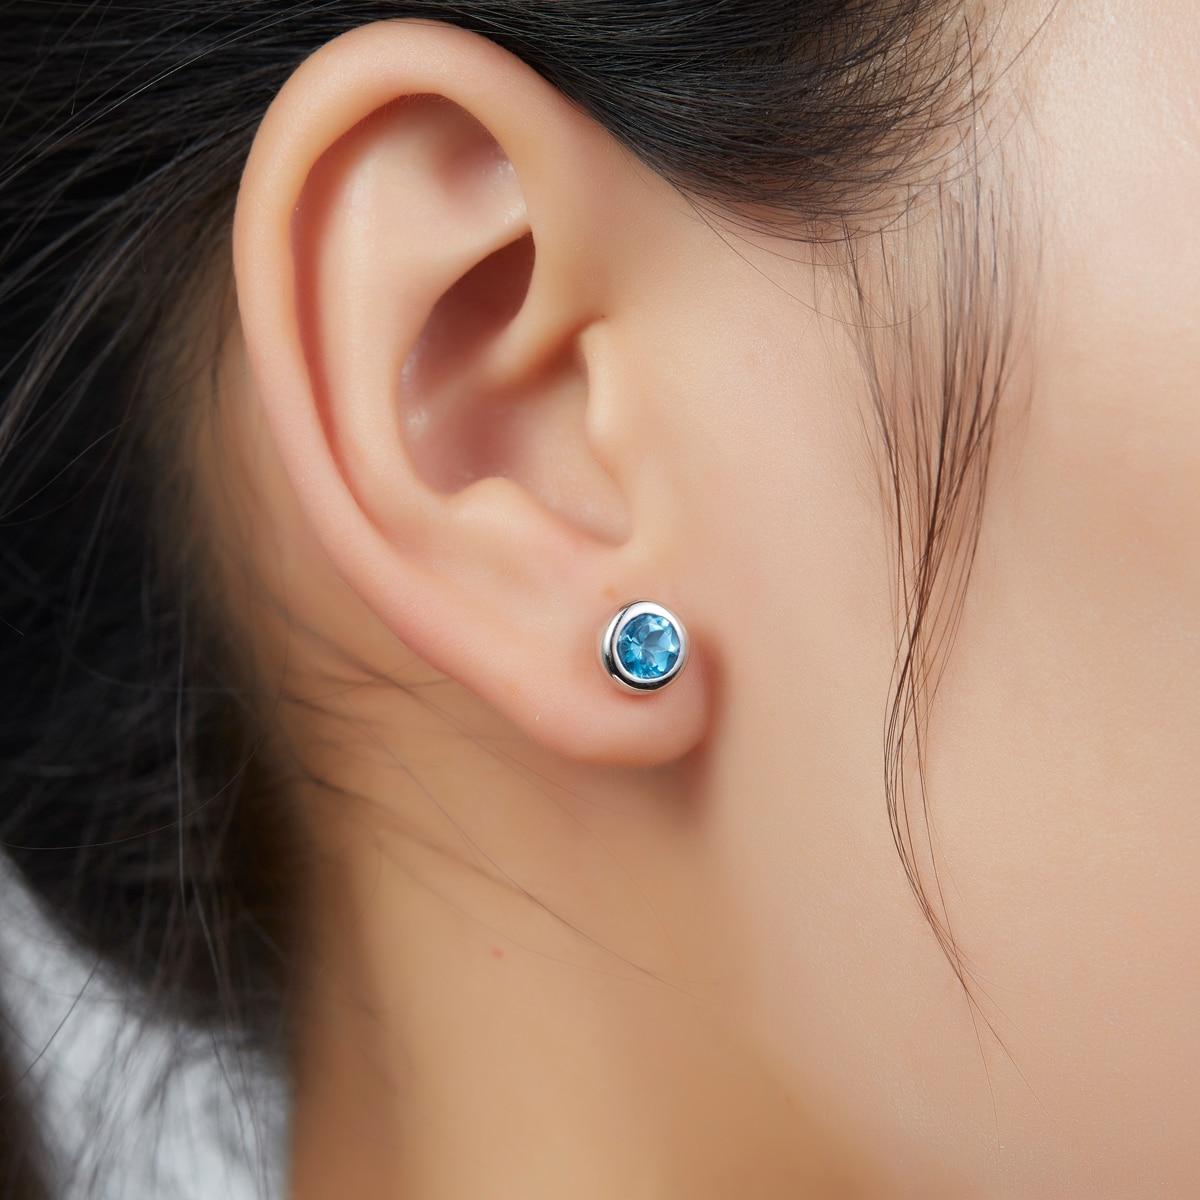 Hutang 1.21ct Round 5mm Swiss Blue Topaz Solid 925 Sterling Silver Stud Earrings for Women Gemstone Fine Jewelry Simple Design planet design gemstone stud earrings